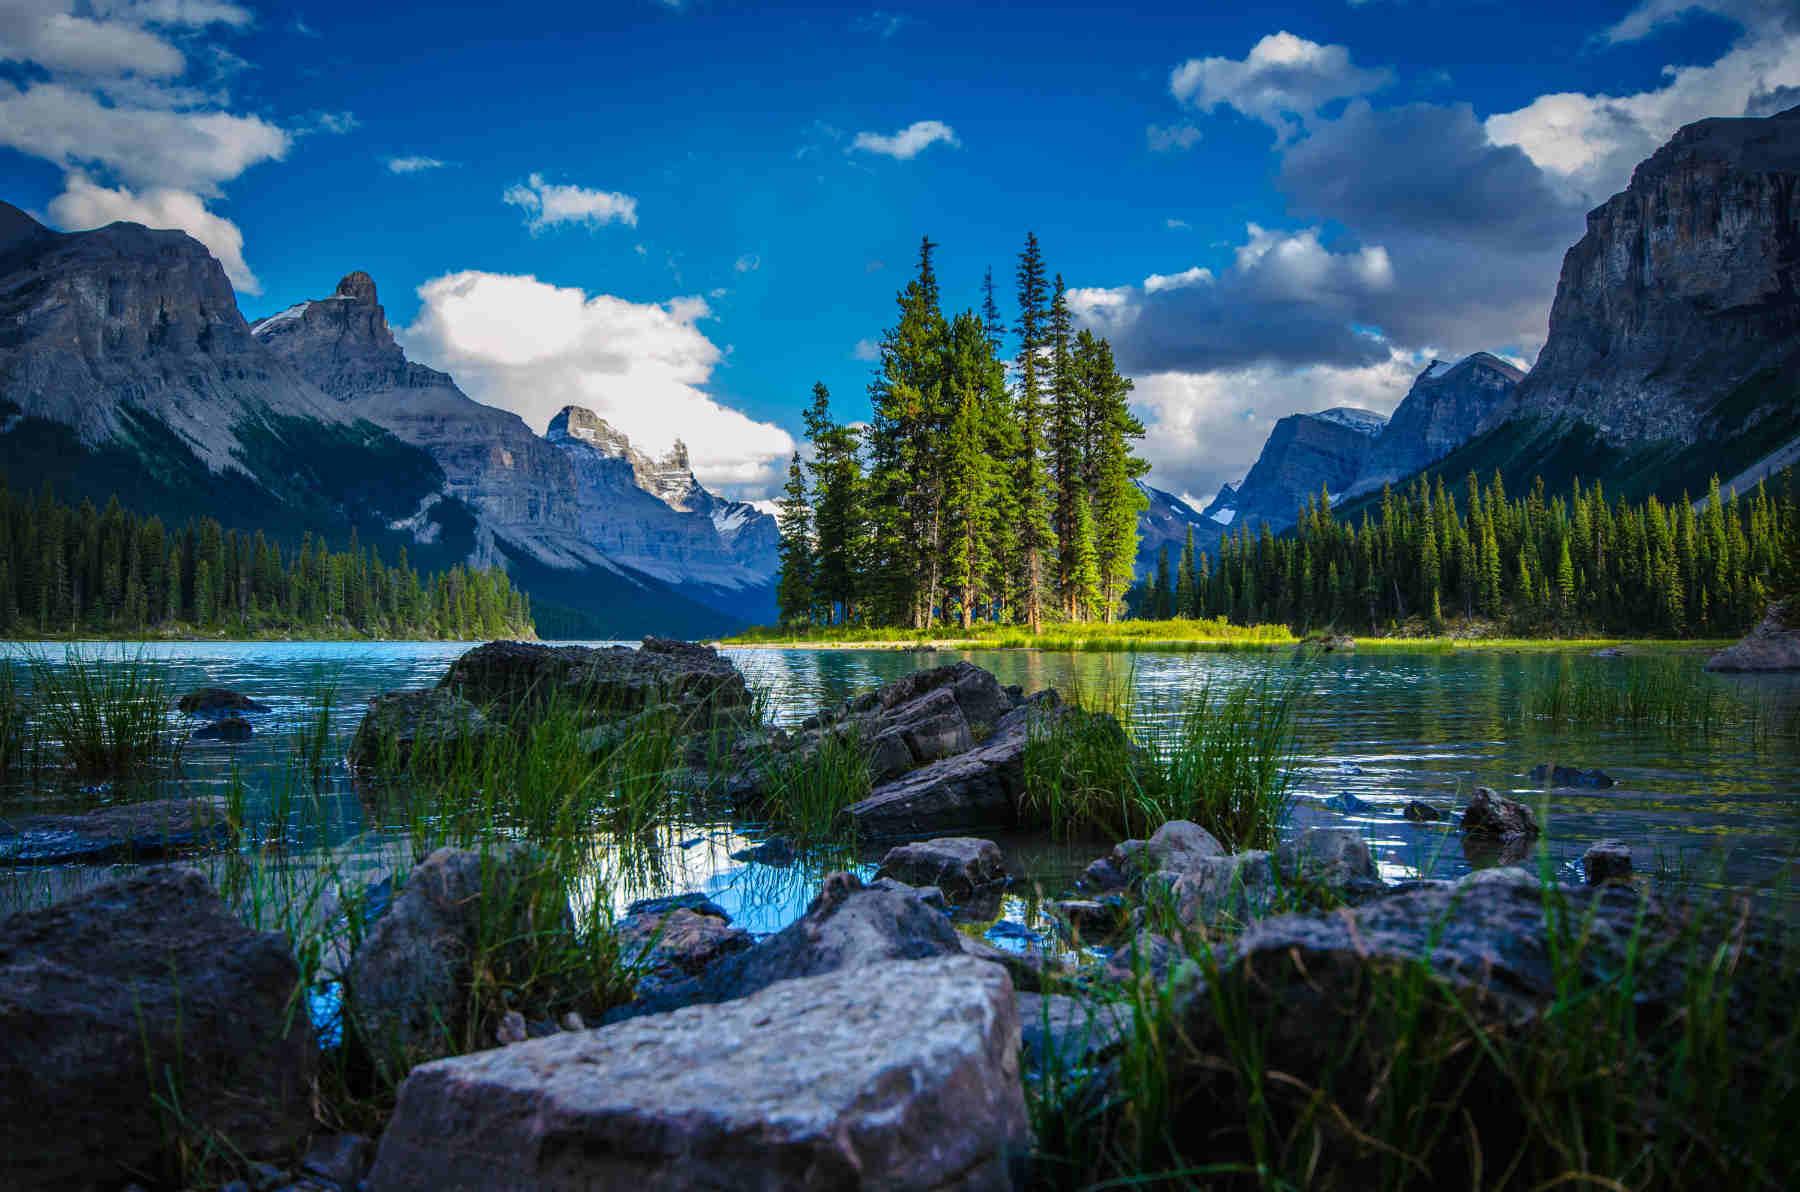 Niagara Falls Wallpaper Heart Of The Rockies Luxury Travel Tour Operator